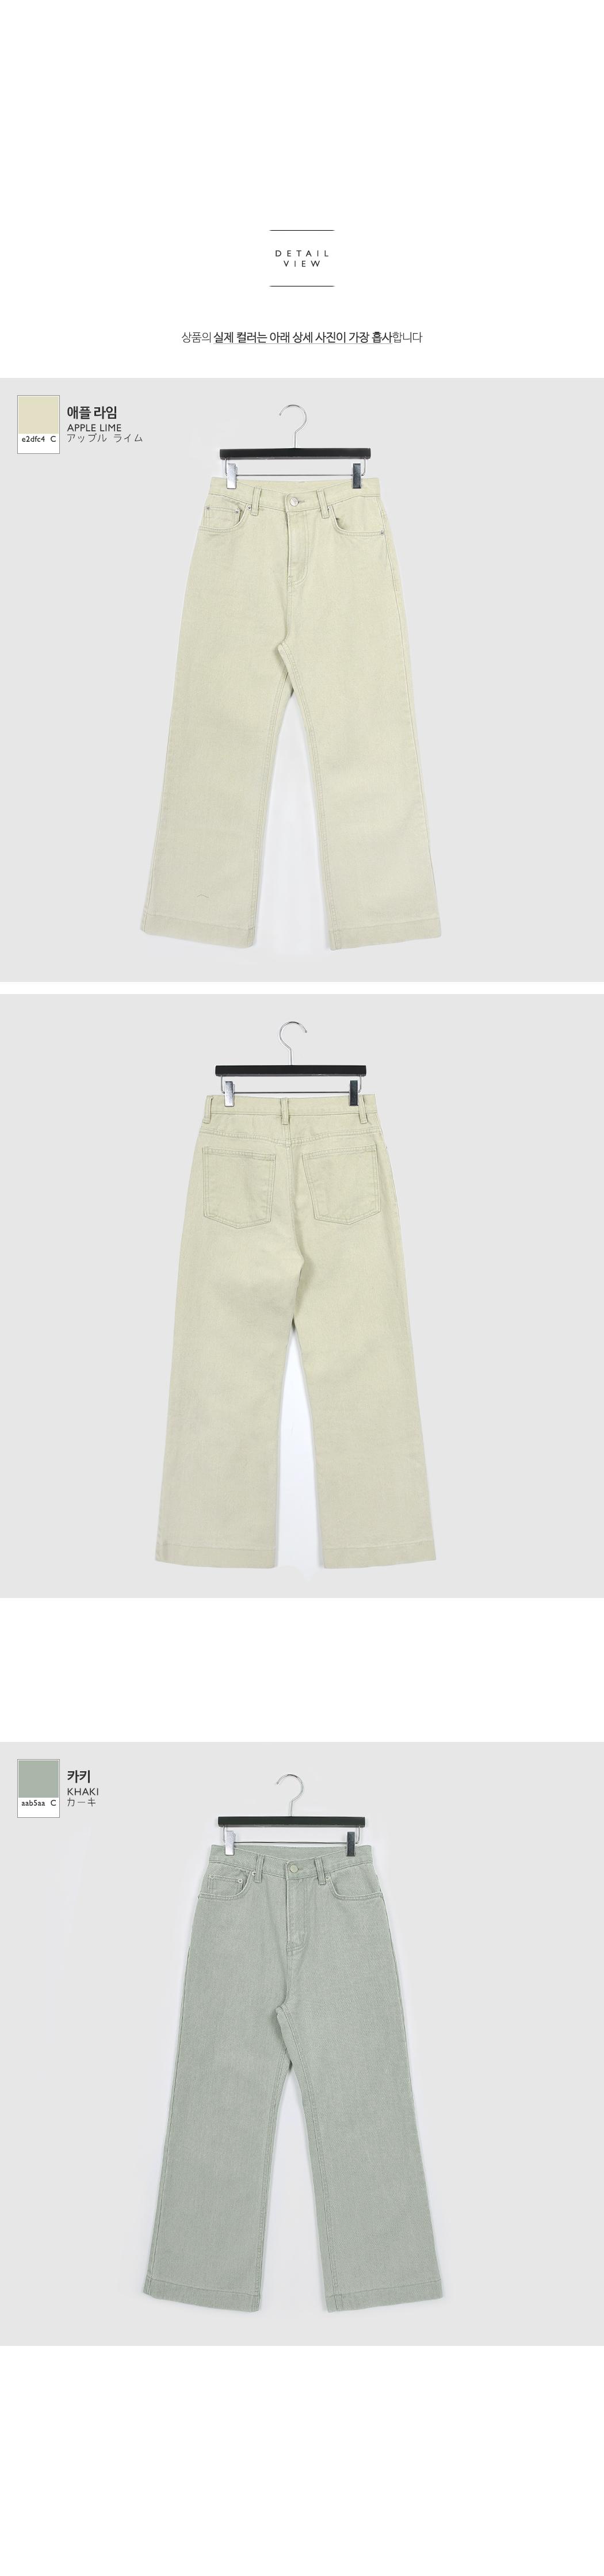 Apple Lime Wide Boot Cut Pants